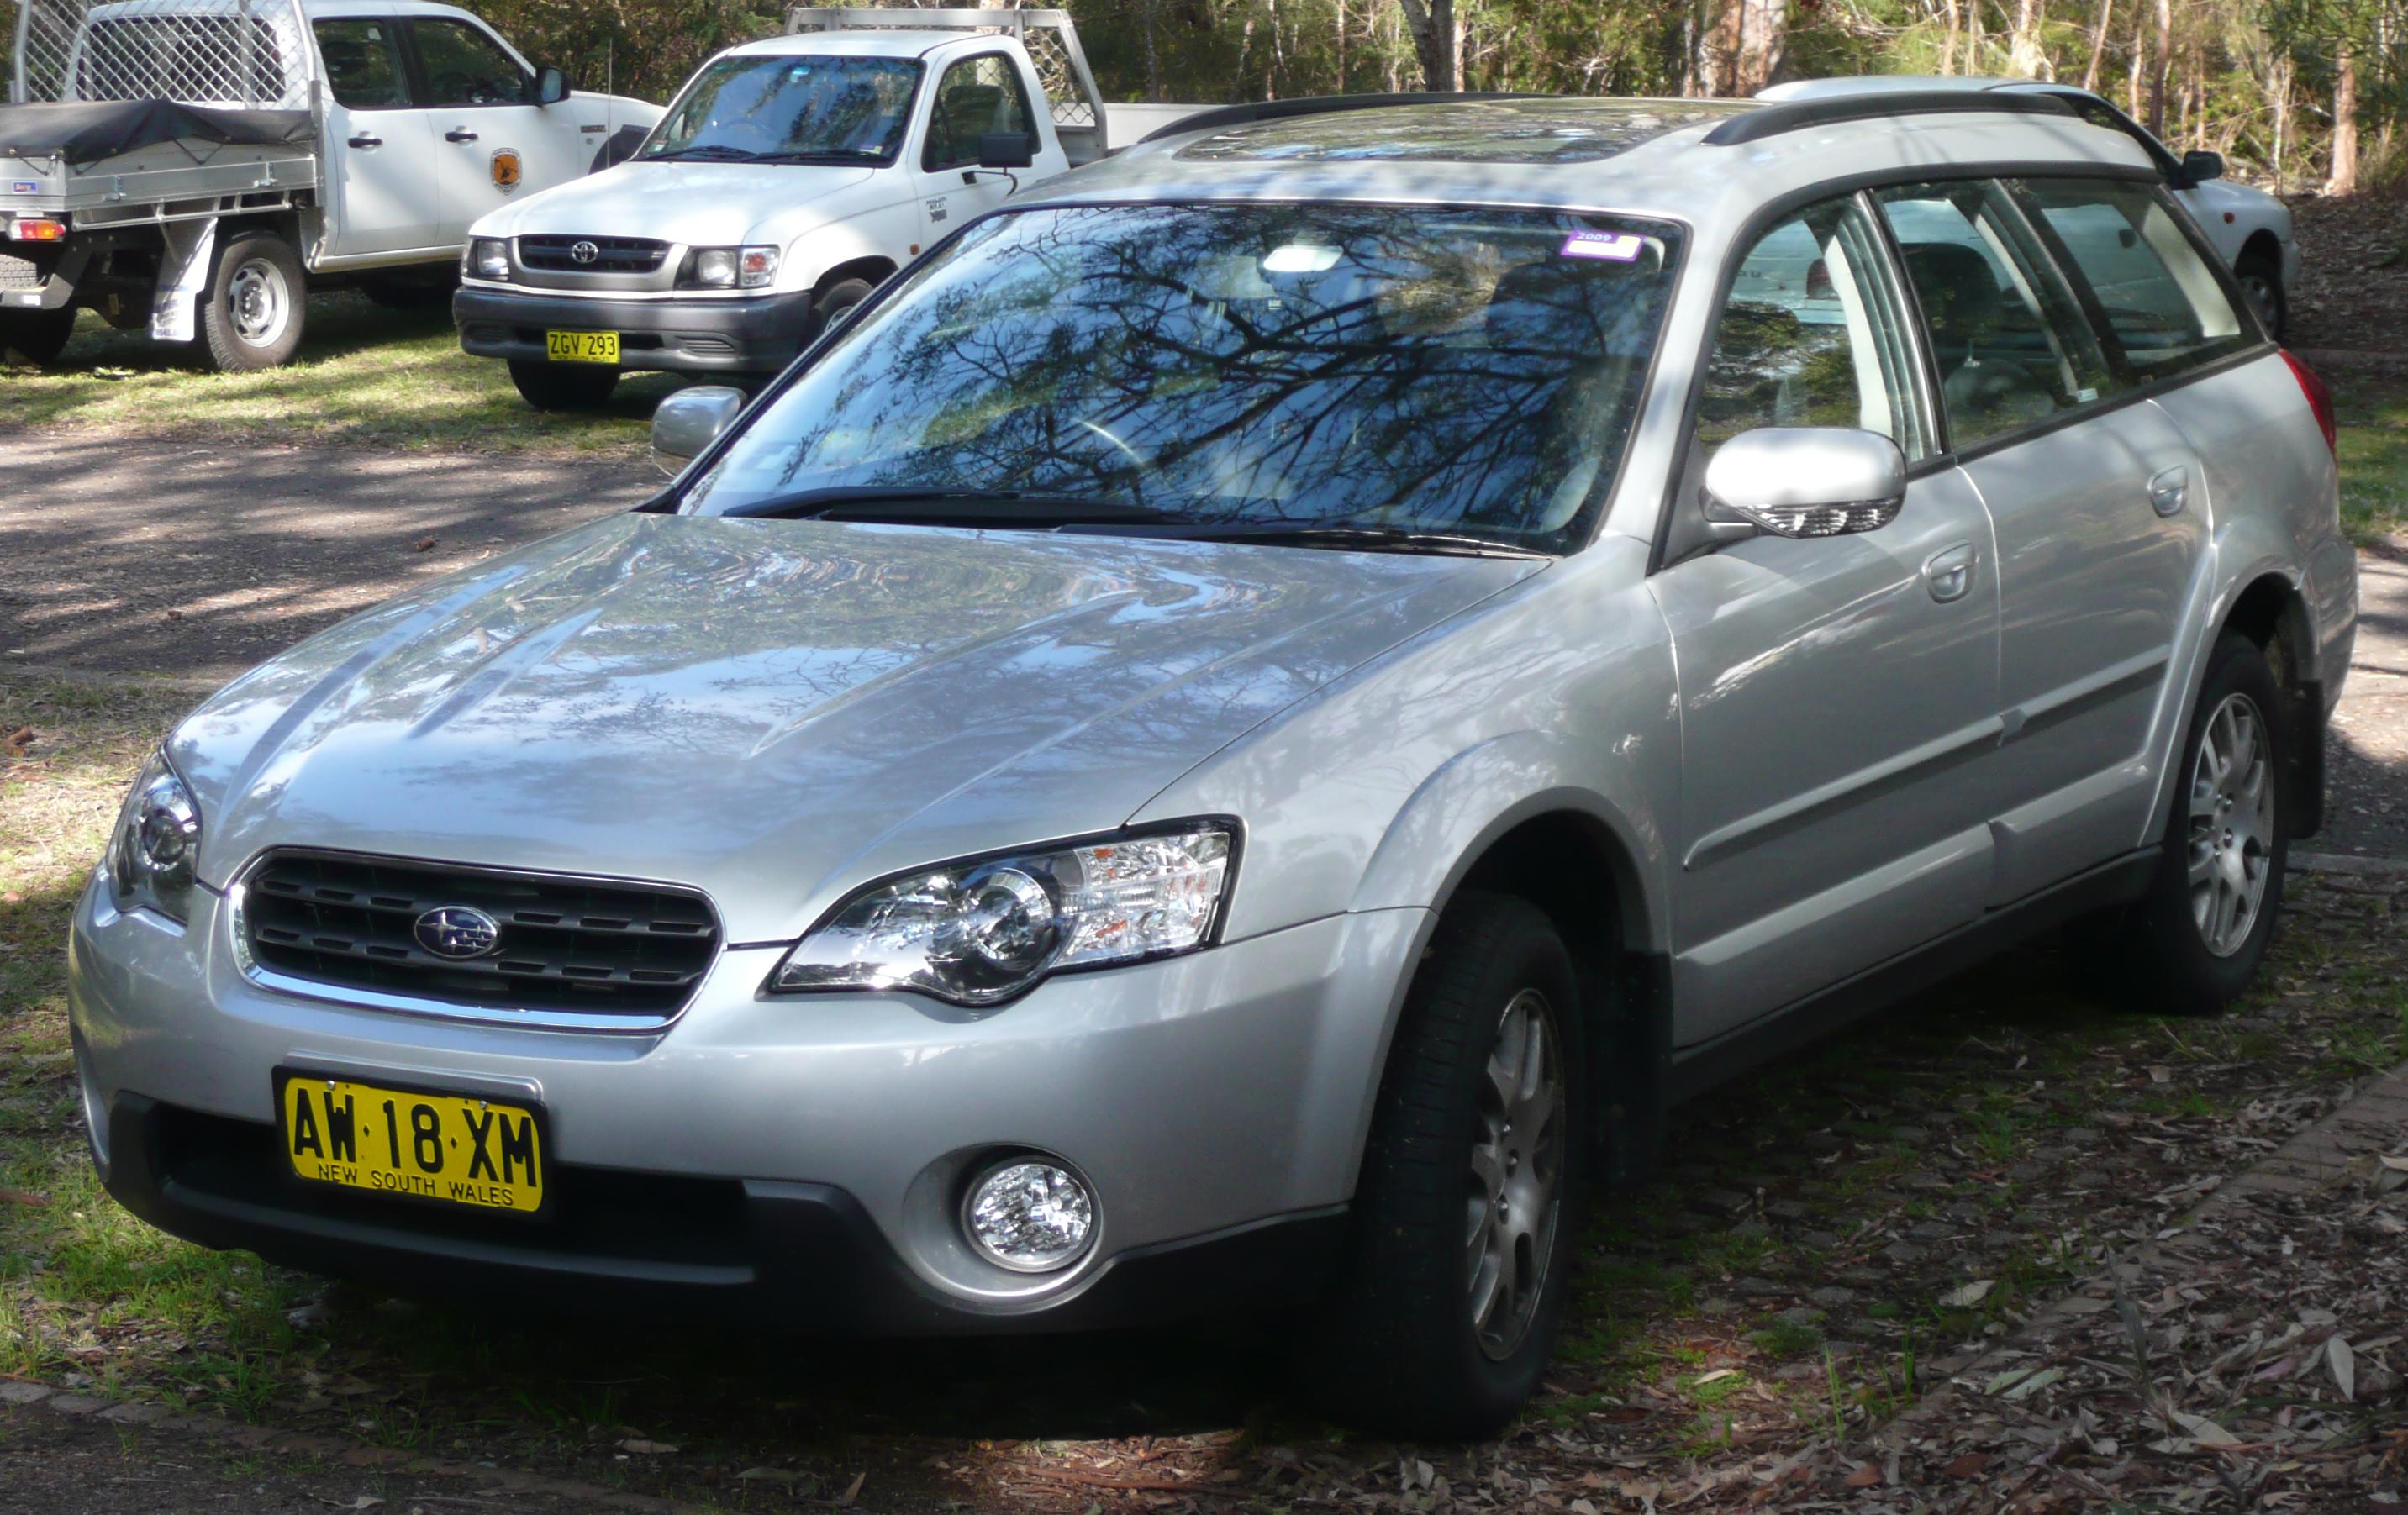 2006 subaru outback information and photos zombiedrive 2006 subaru outback 11 subaru outback 11 vanachro Image collections